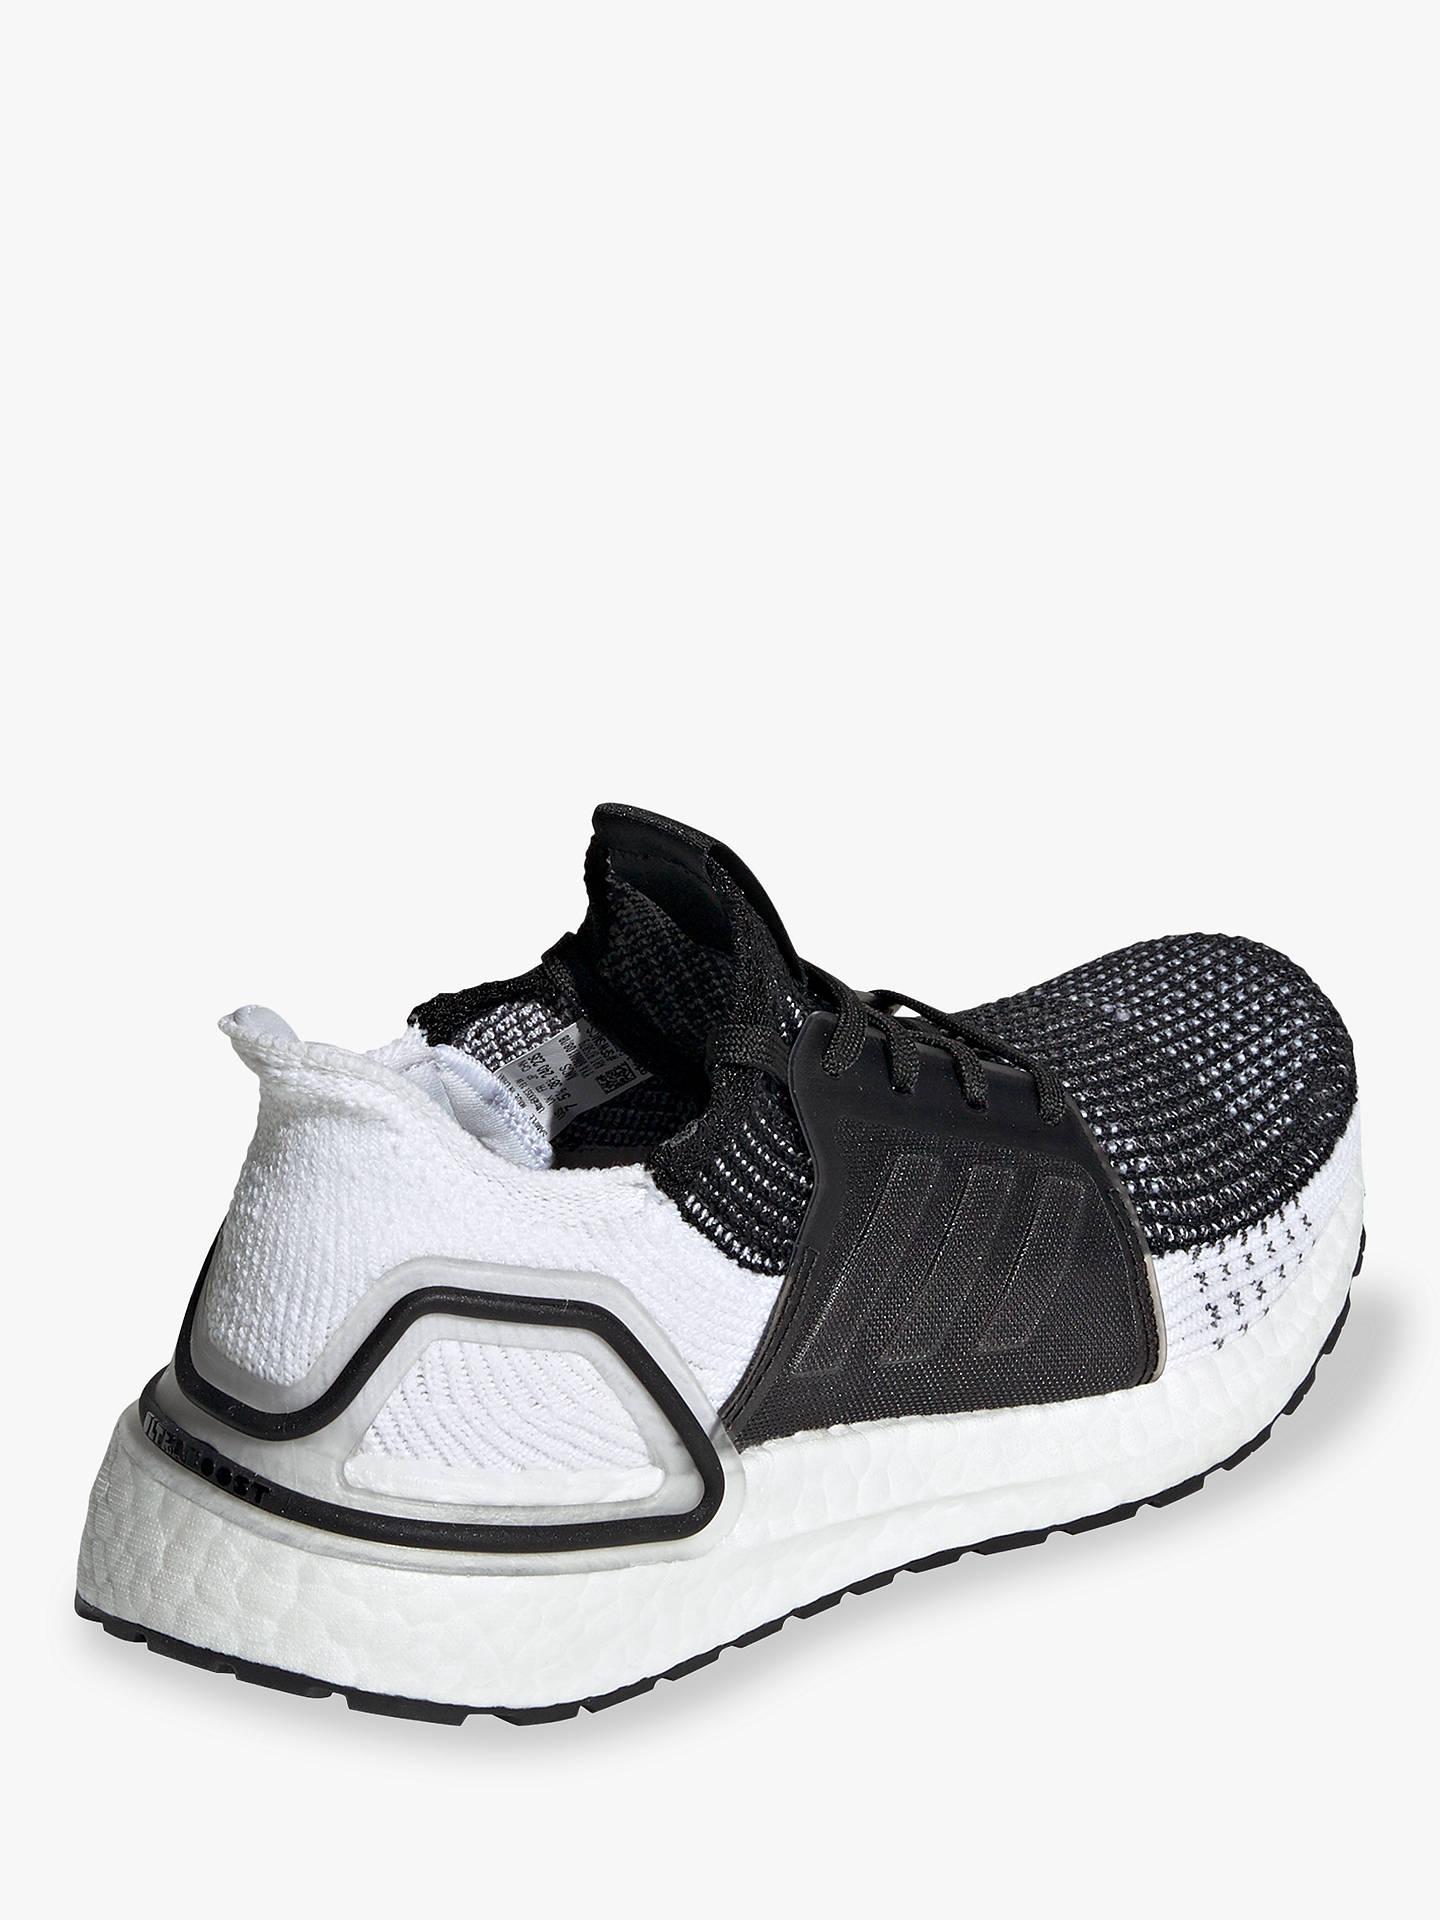 000d656ea01 ... Buy adidas UltraBOOST 19 Women s Running Shoes